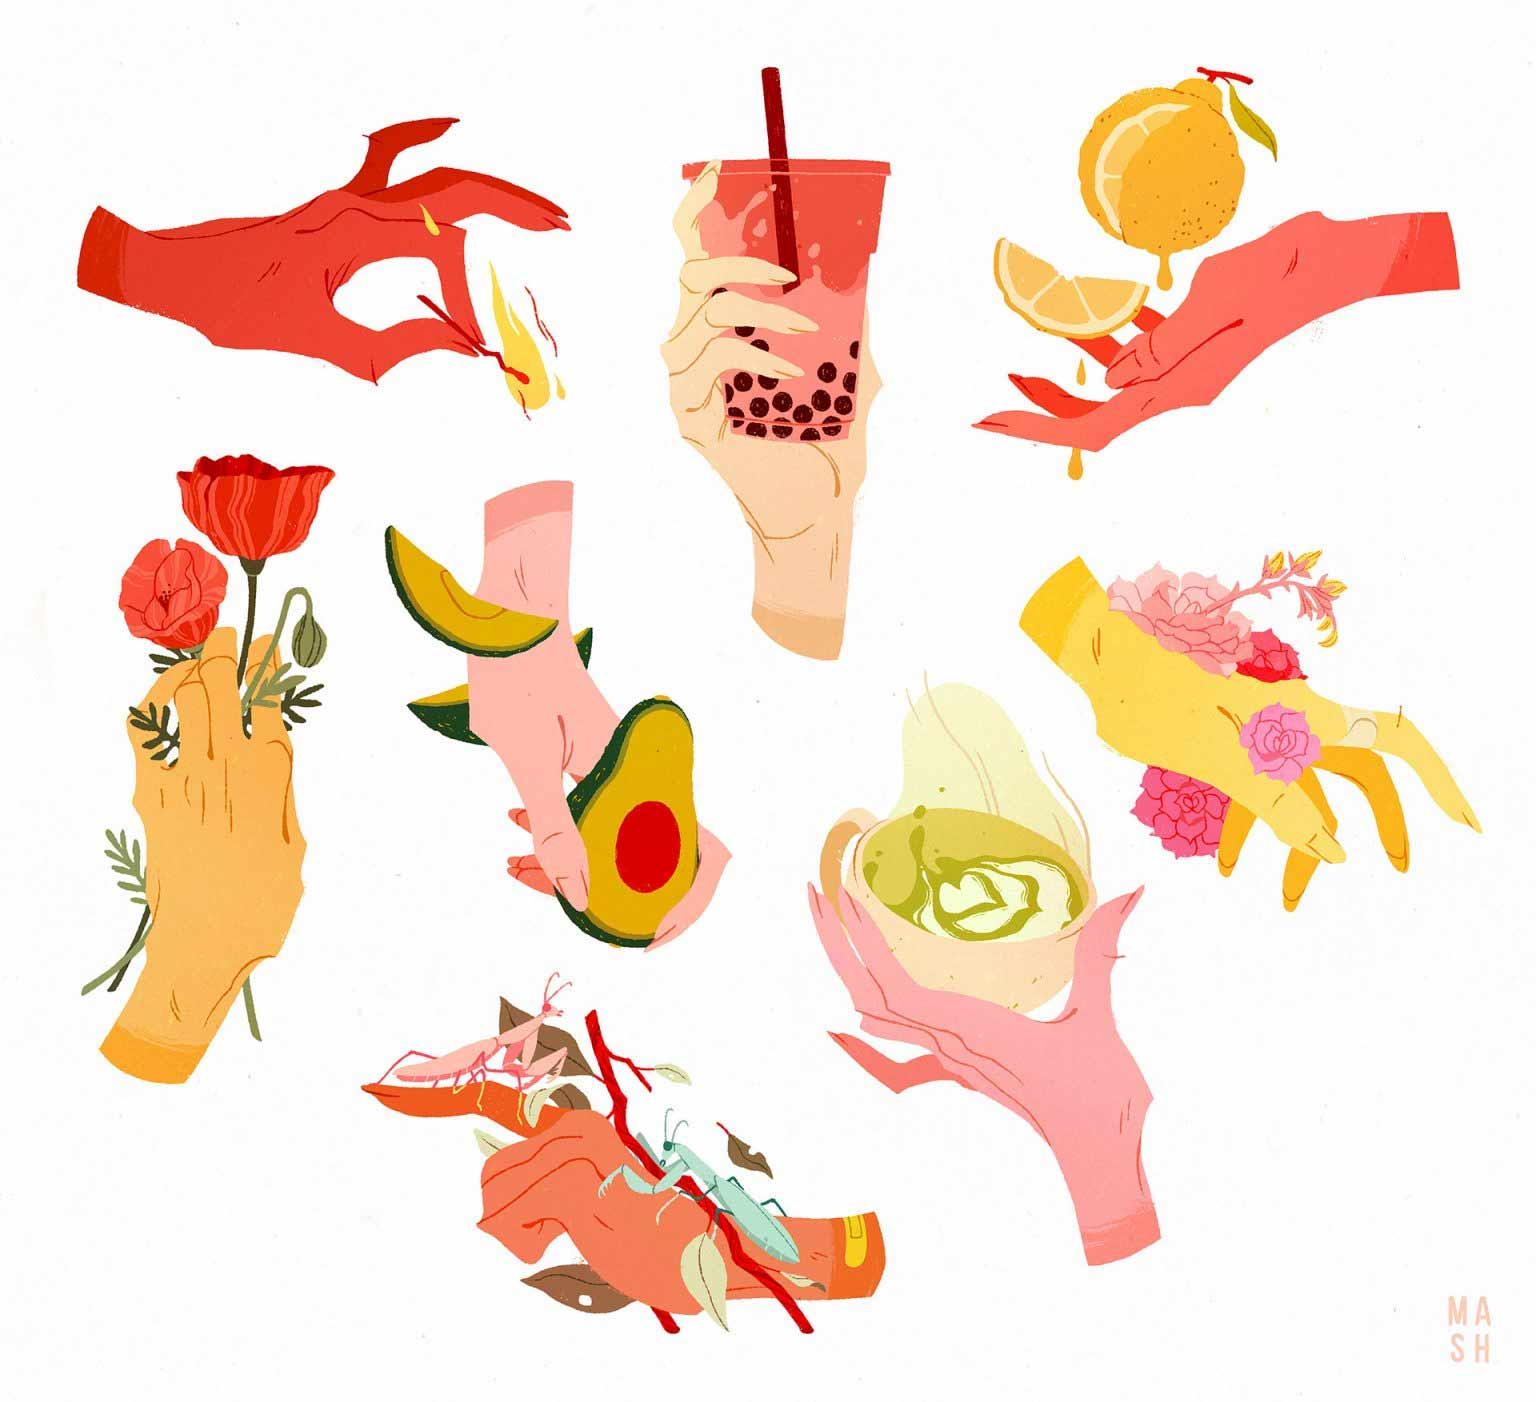 Illustrationen von Samantha Mash samantha-mash-illustrationen_06